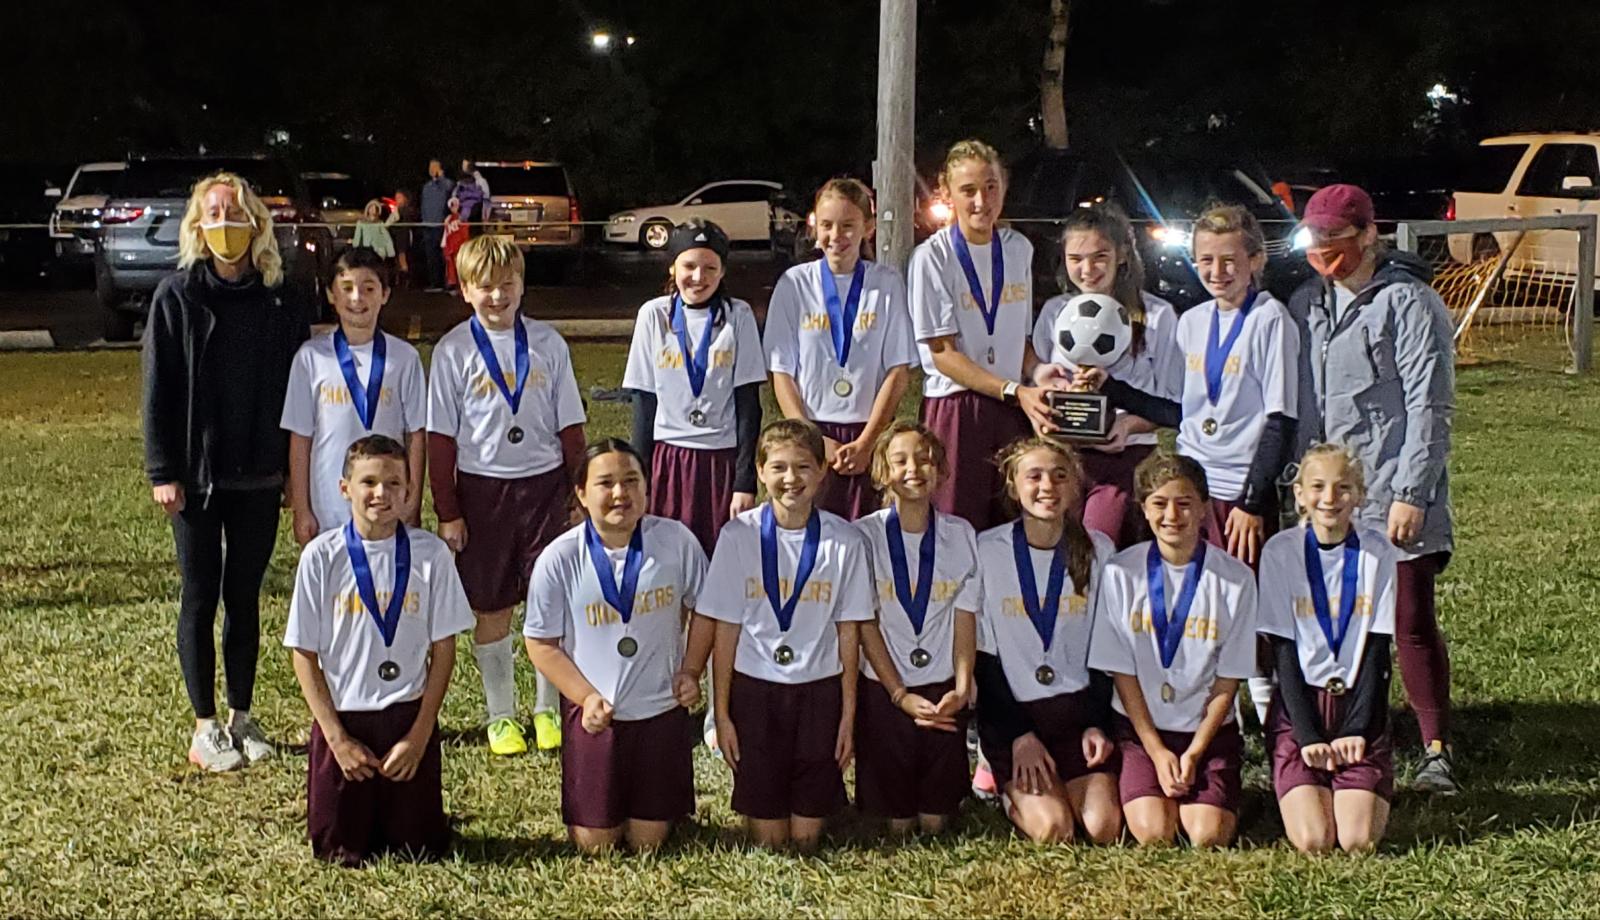 Congratulations Middle School Soccer